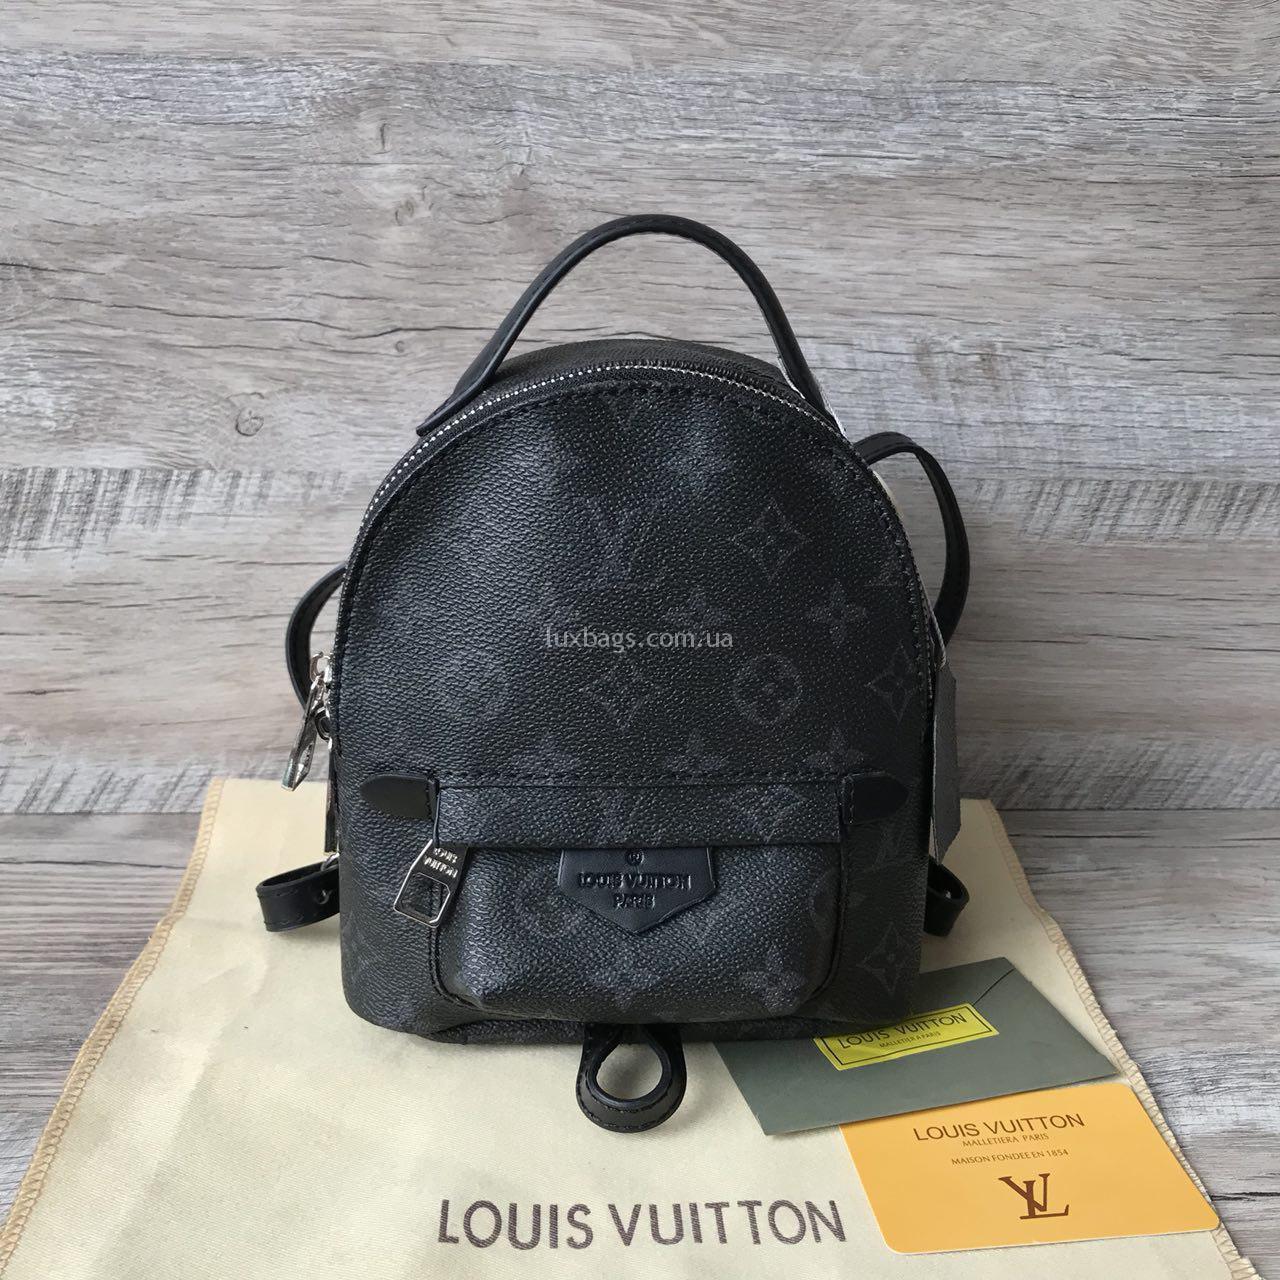 1fb25d20cff0 Женский мини рюкзак Louis Vuitton Луи Виттон Купить на lux-bags